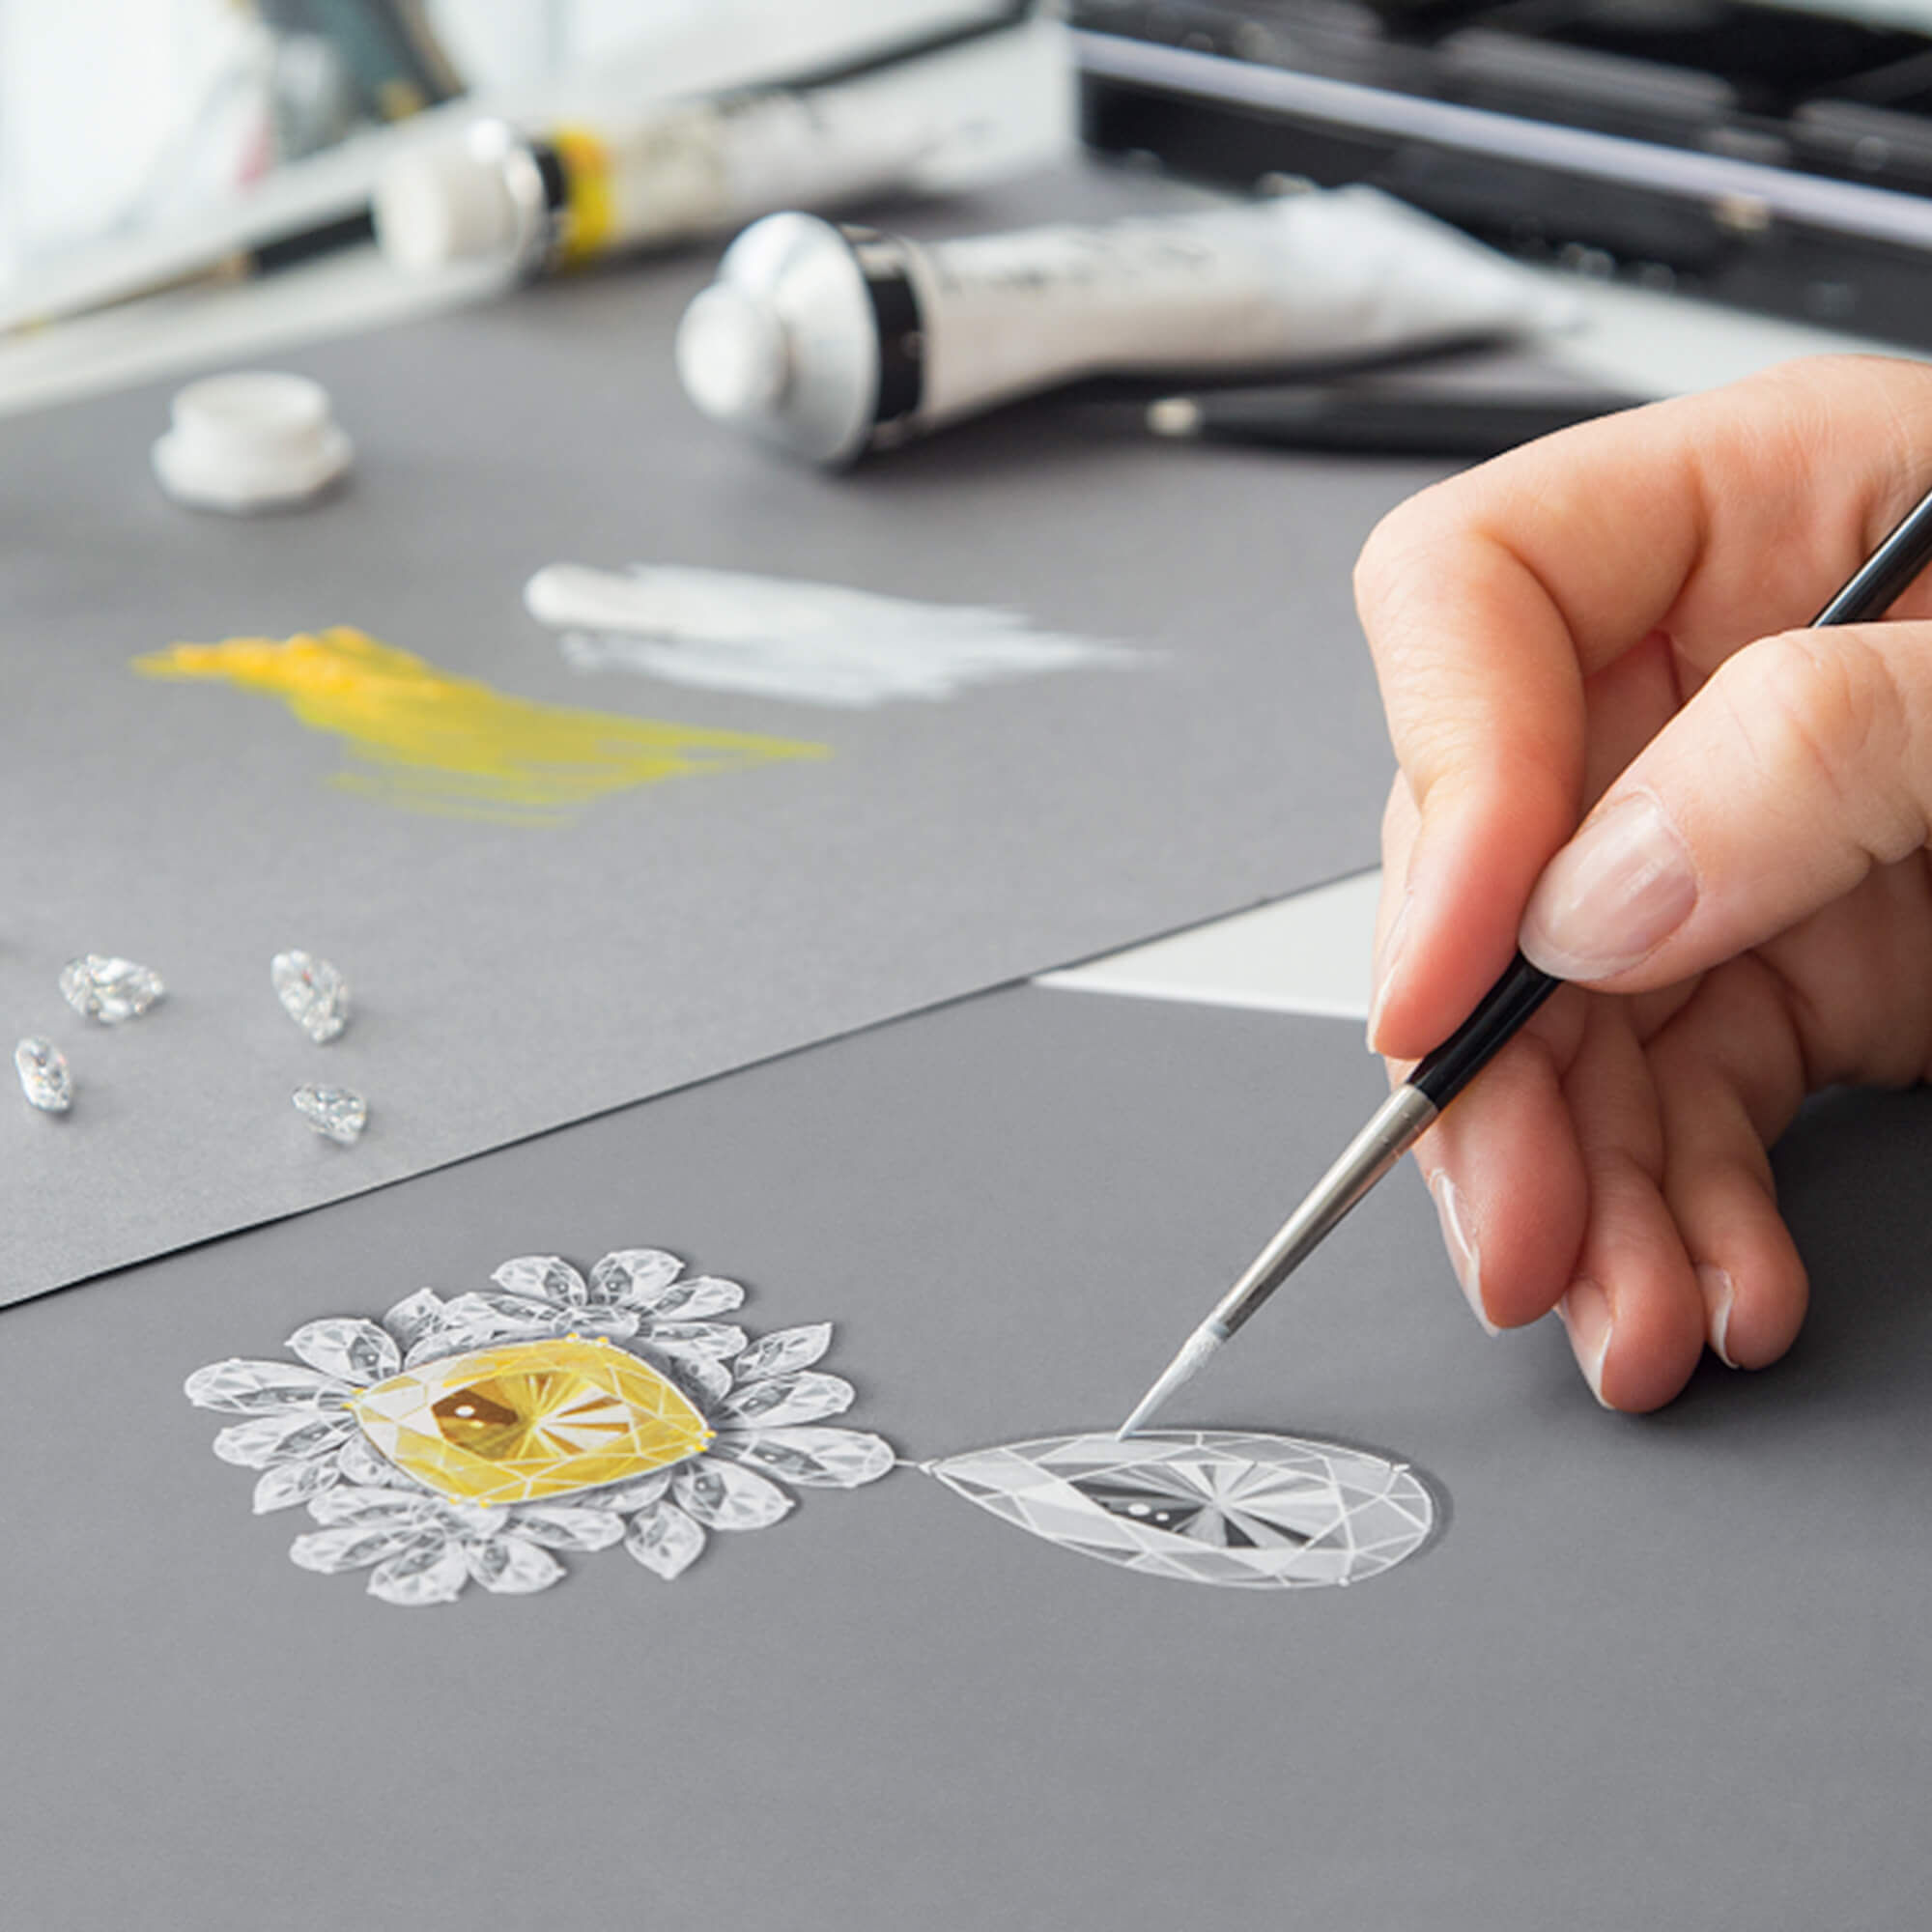 Designer drawing a high jewellery brooch